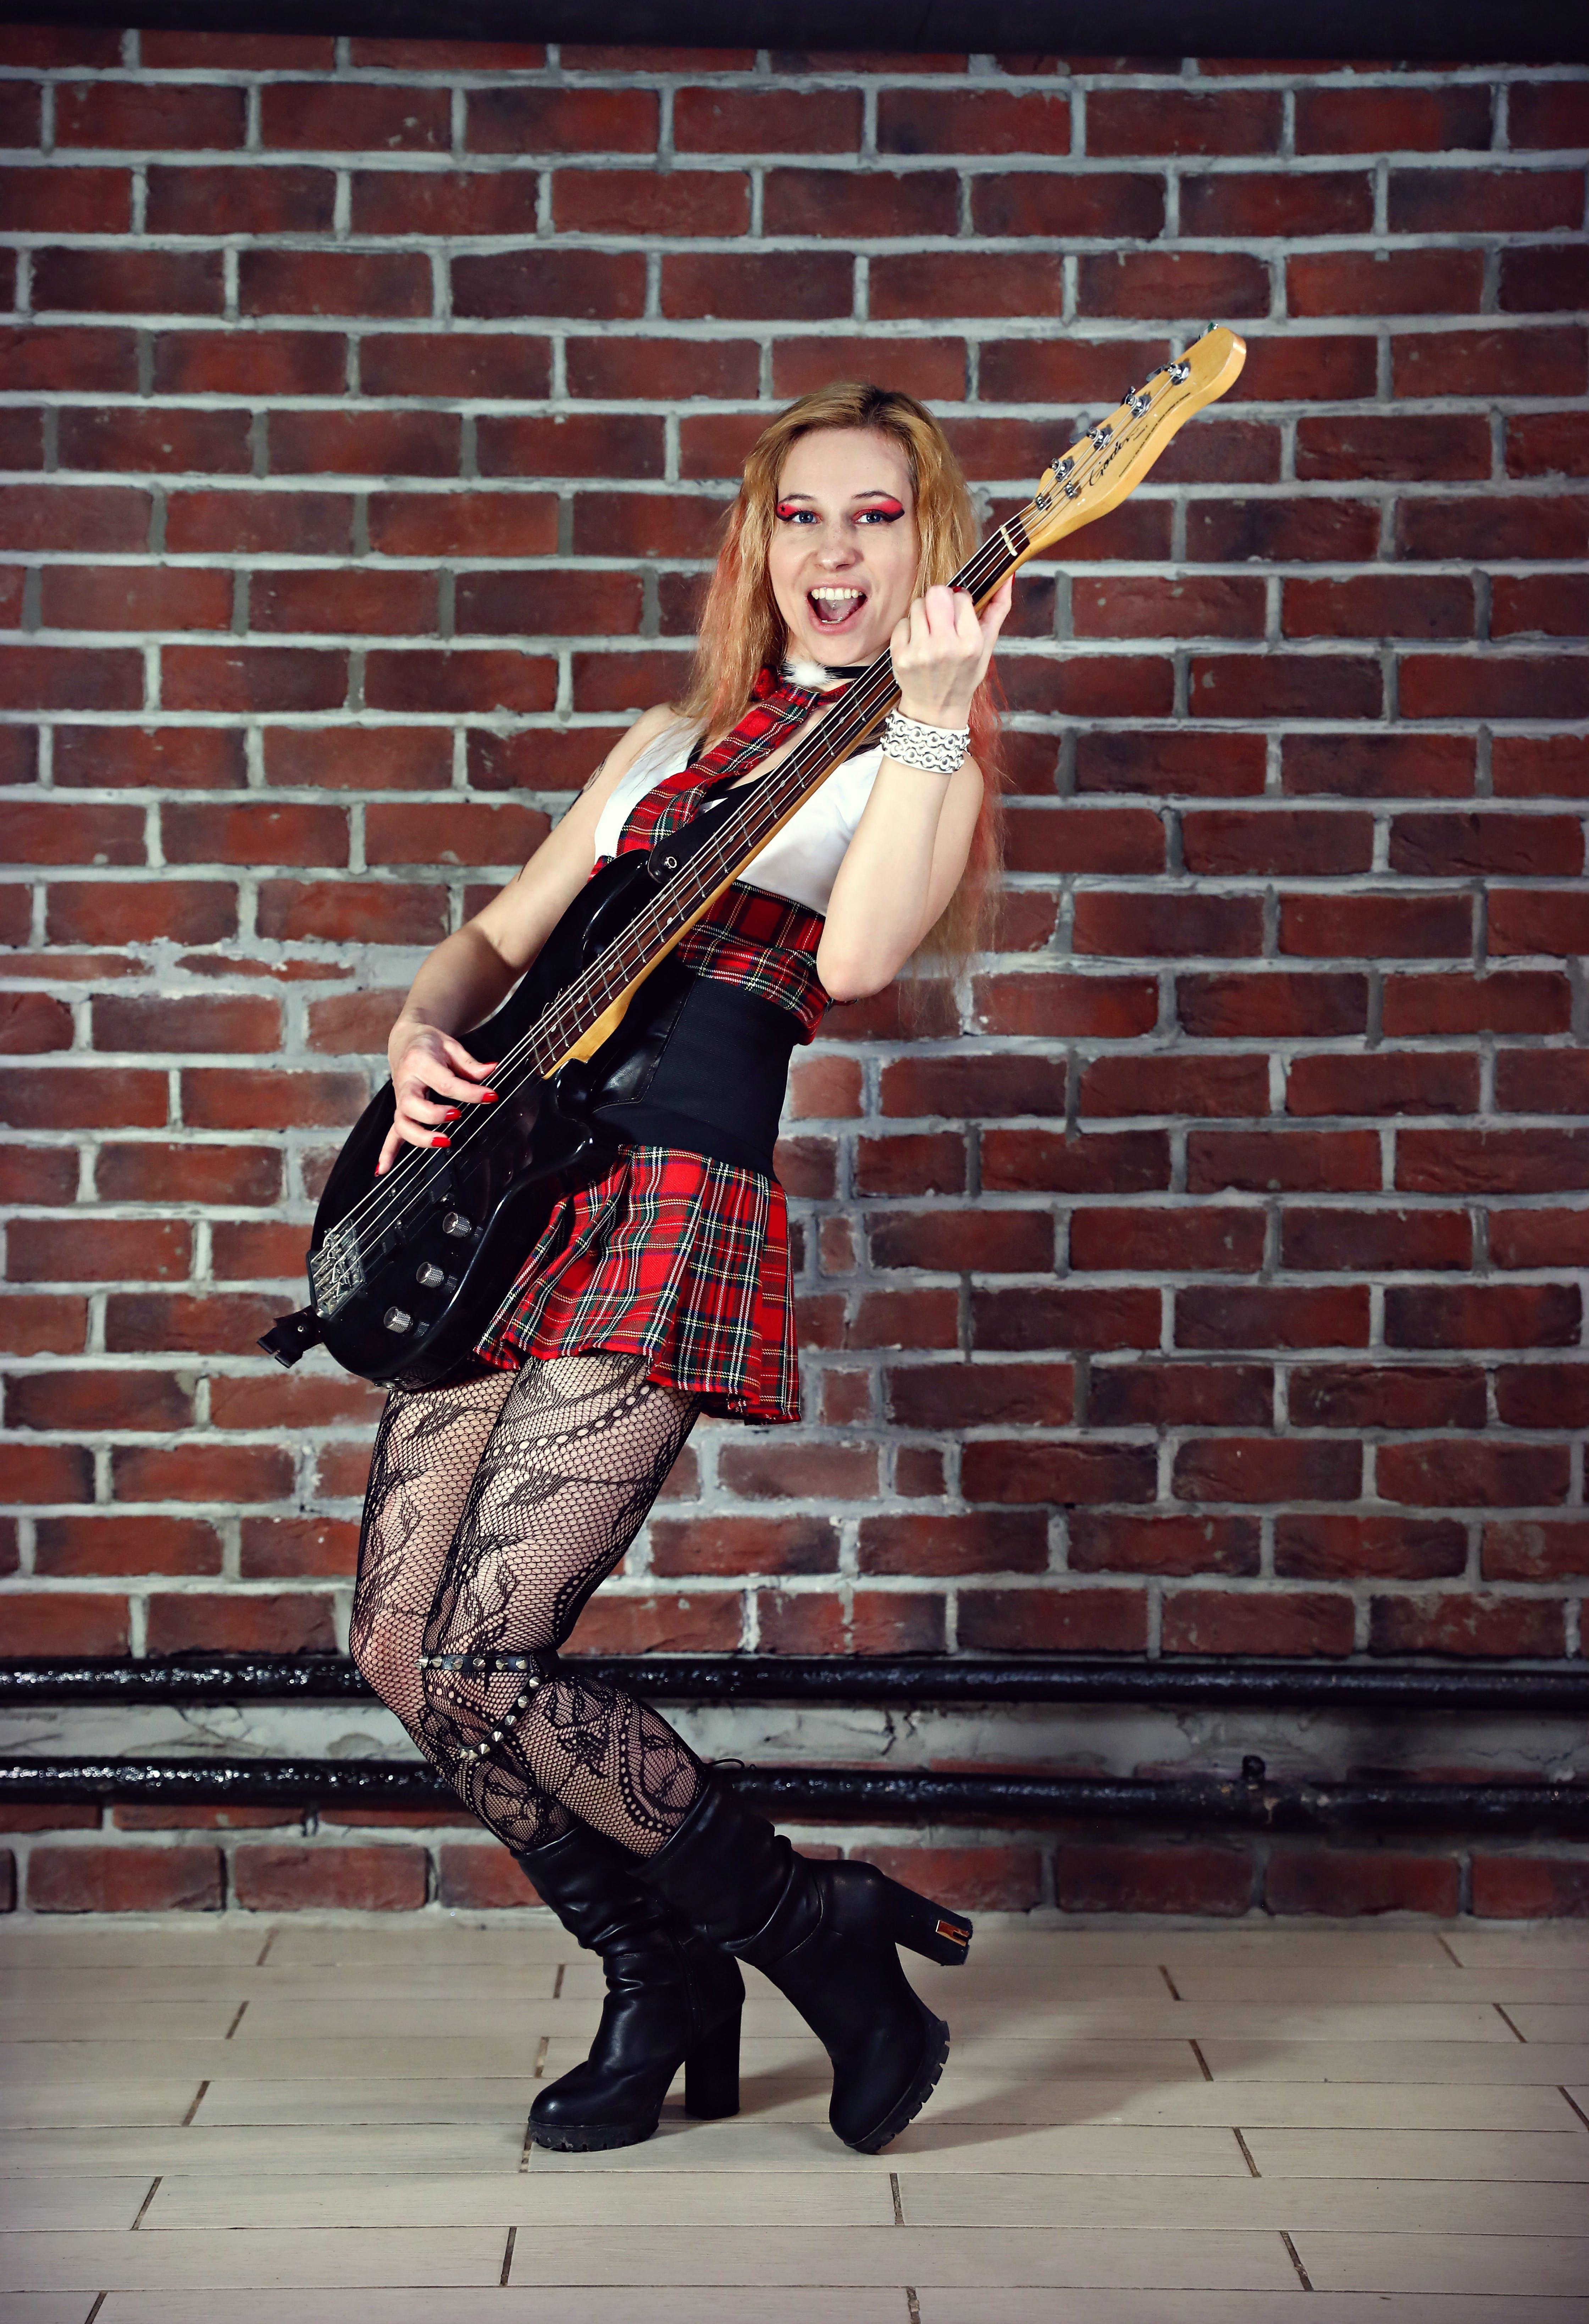 Free stock photo of rock